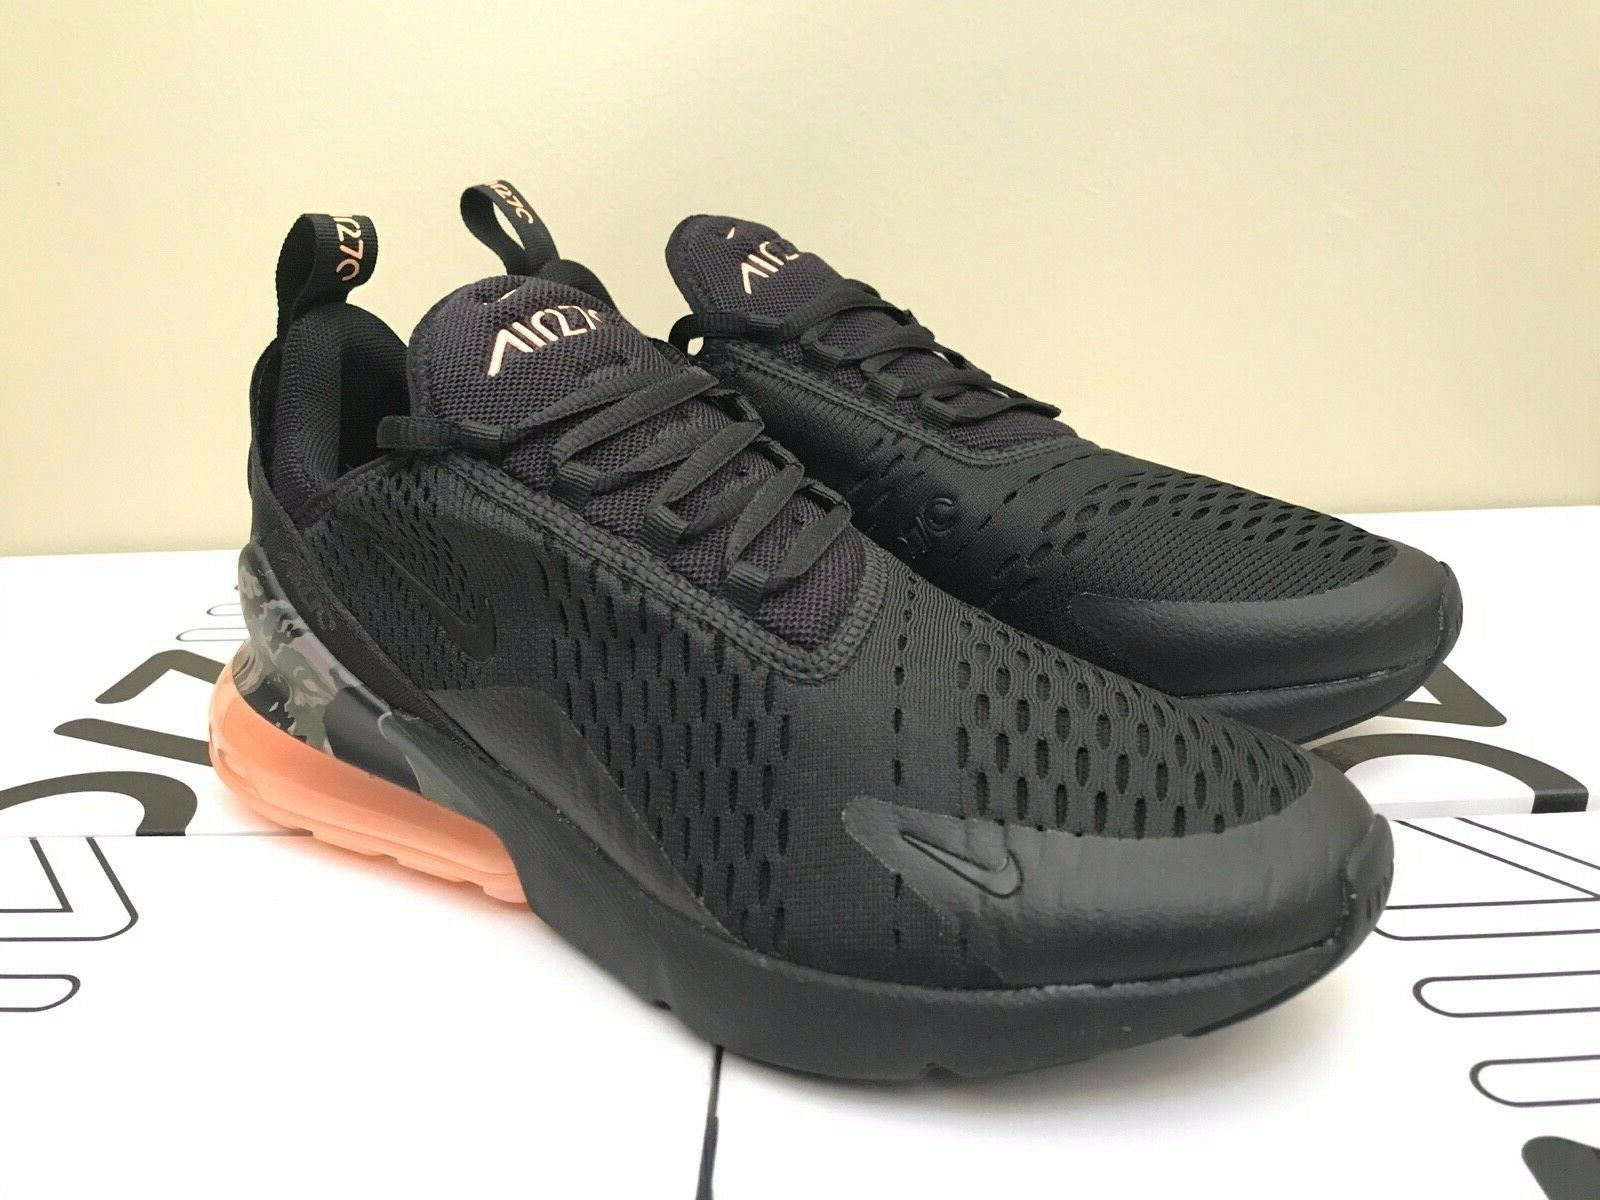 Nike Air Max 270 Camo Sunset, AQ6239 001, (Camo Heel) Brand New